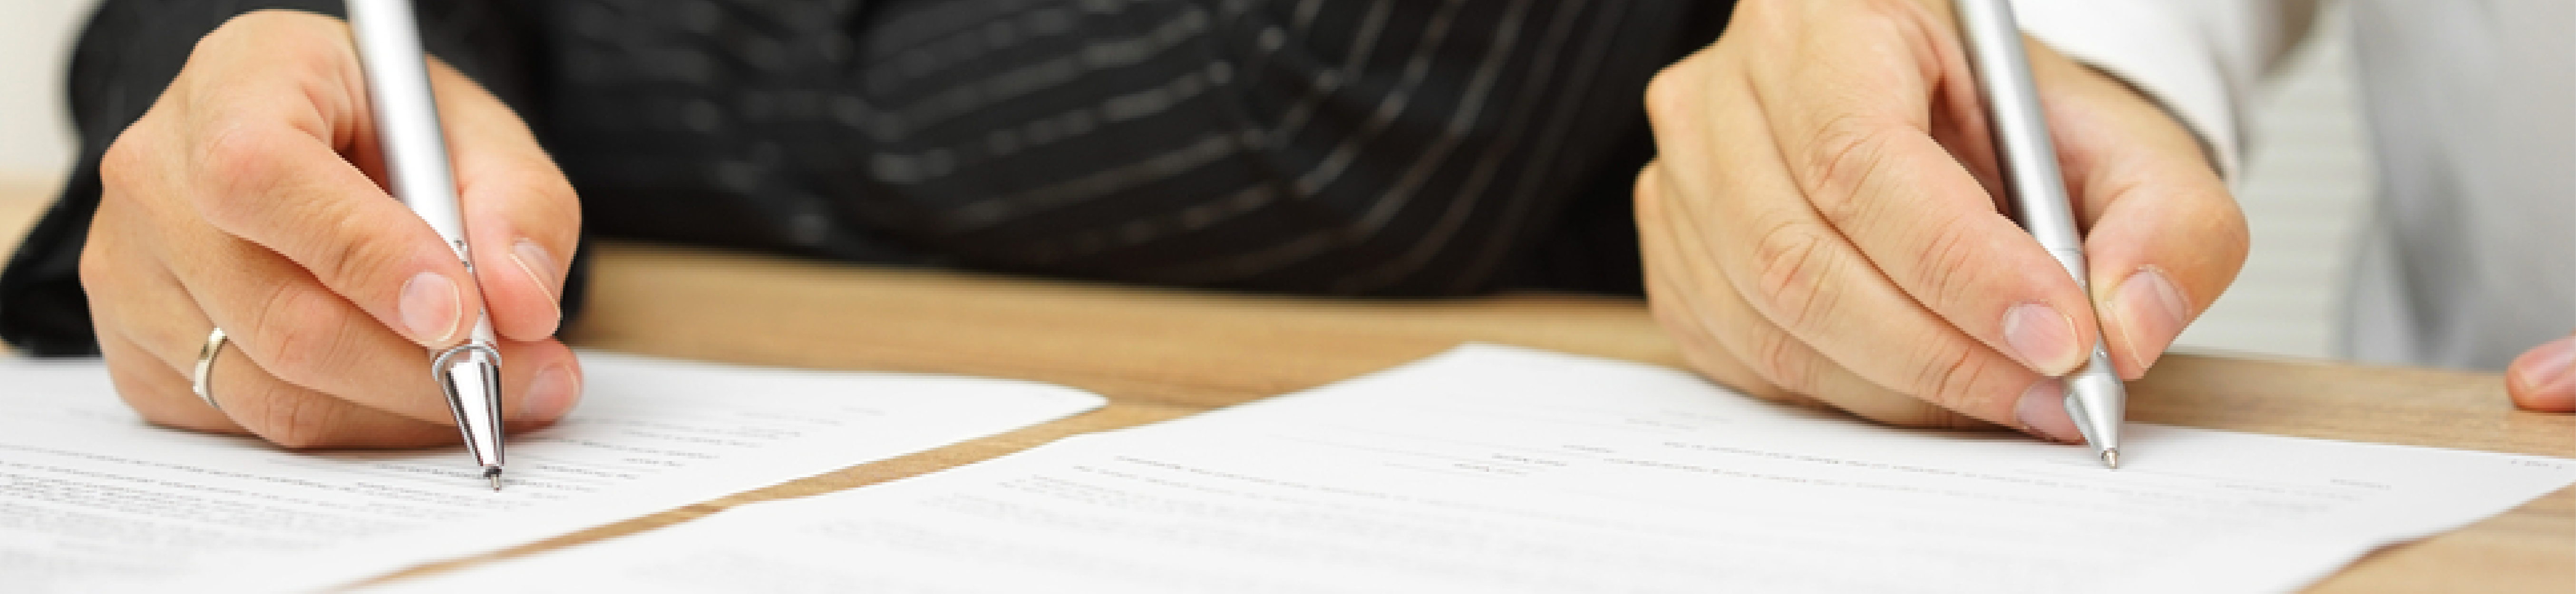 Parents sign a child custody agreement